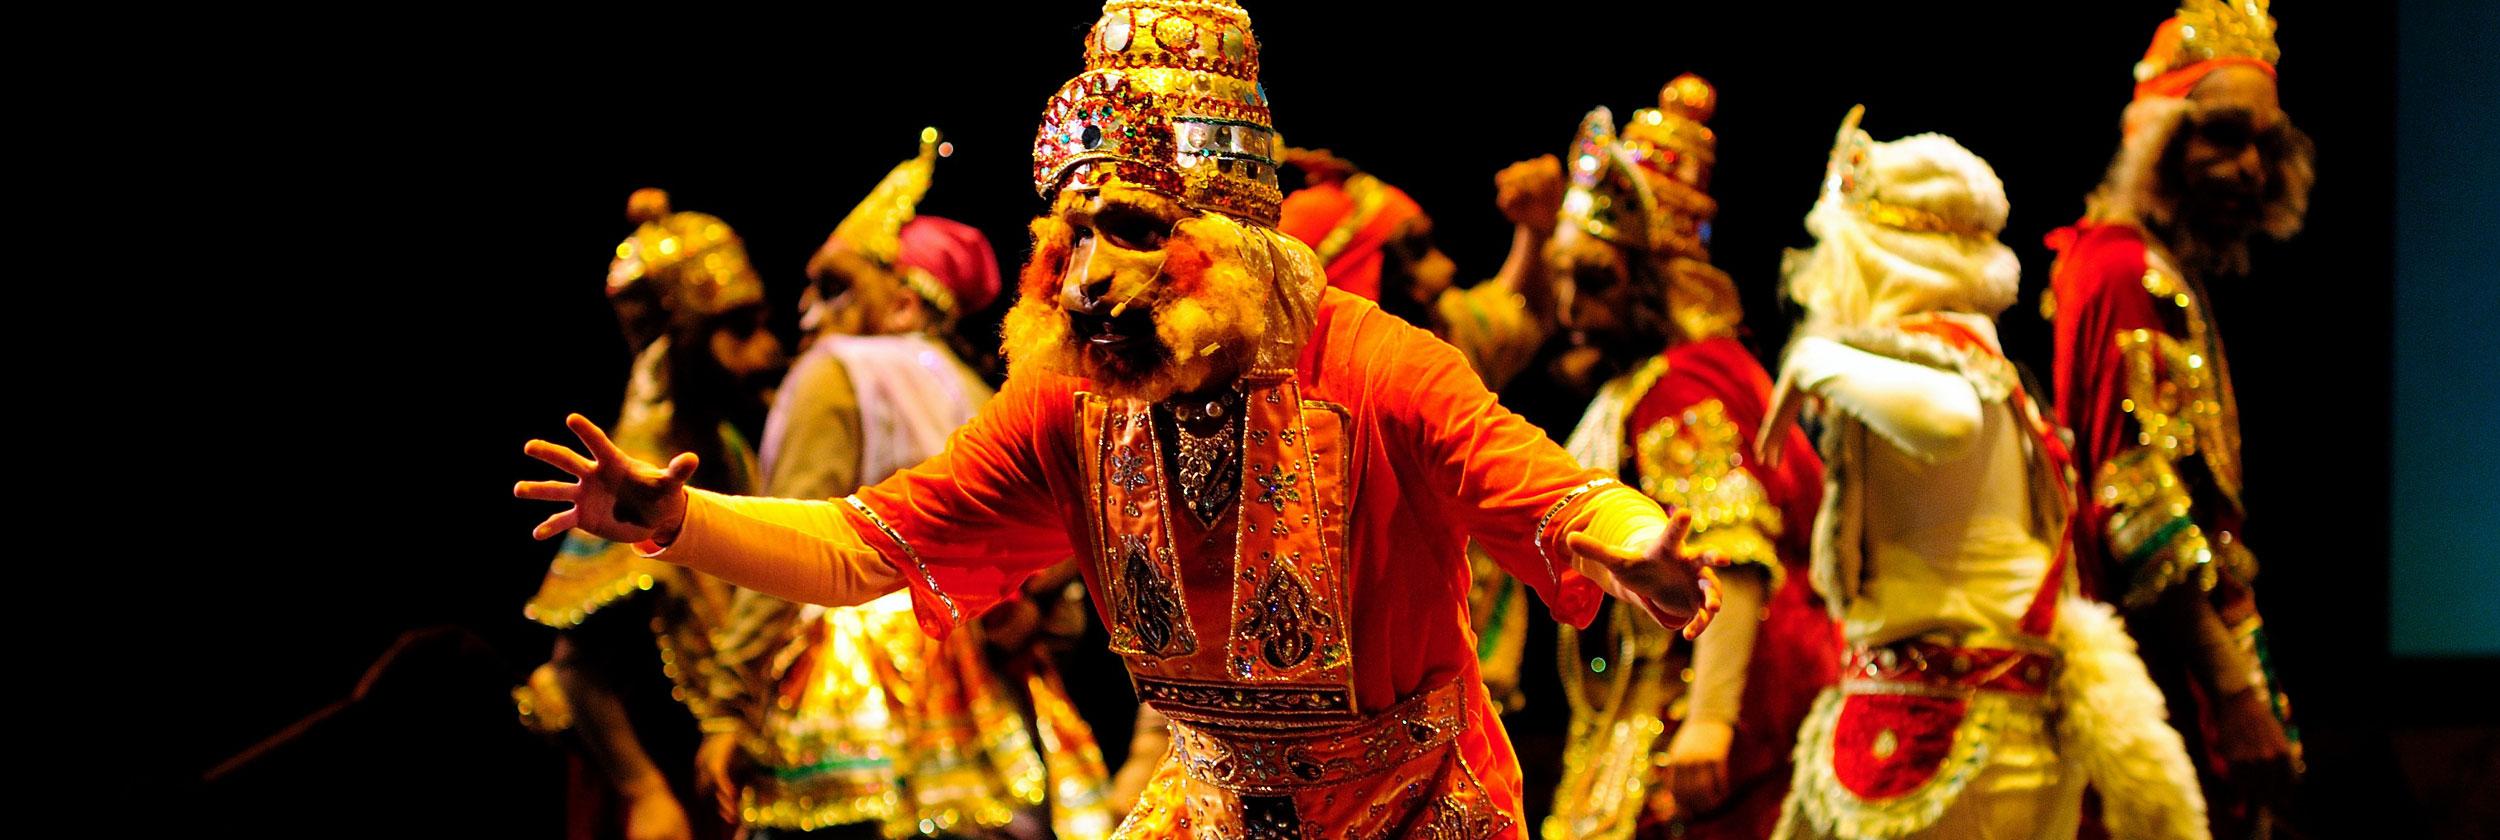 Ramayana! – Tickets on sale now! : Mount Madonna School